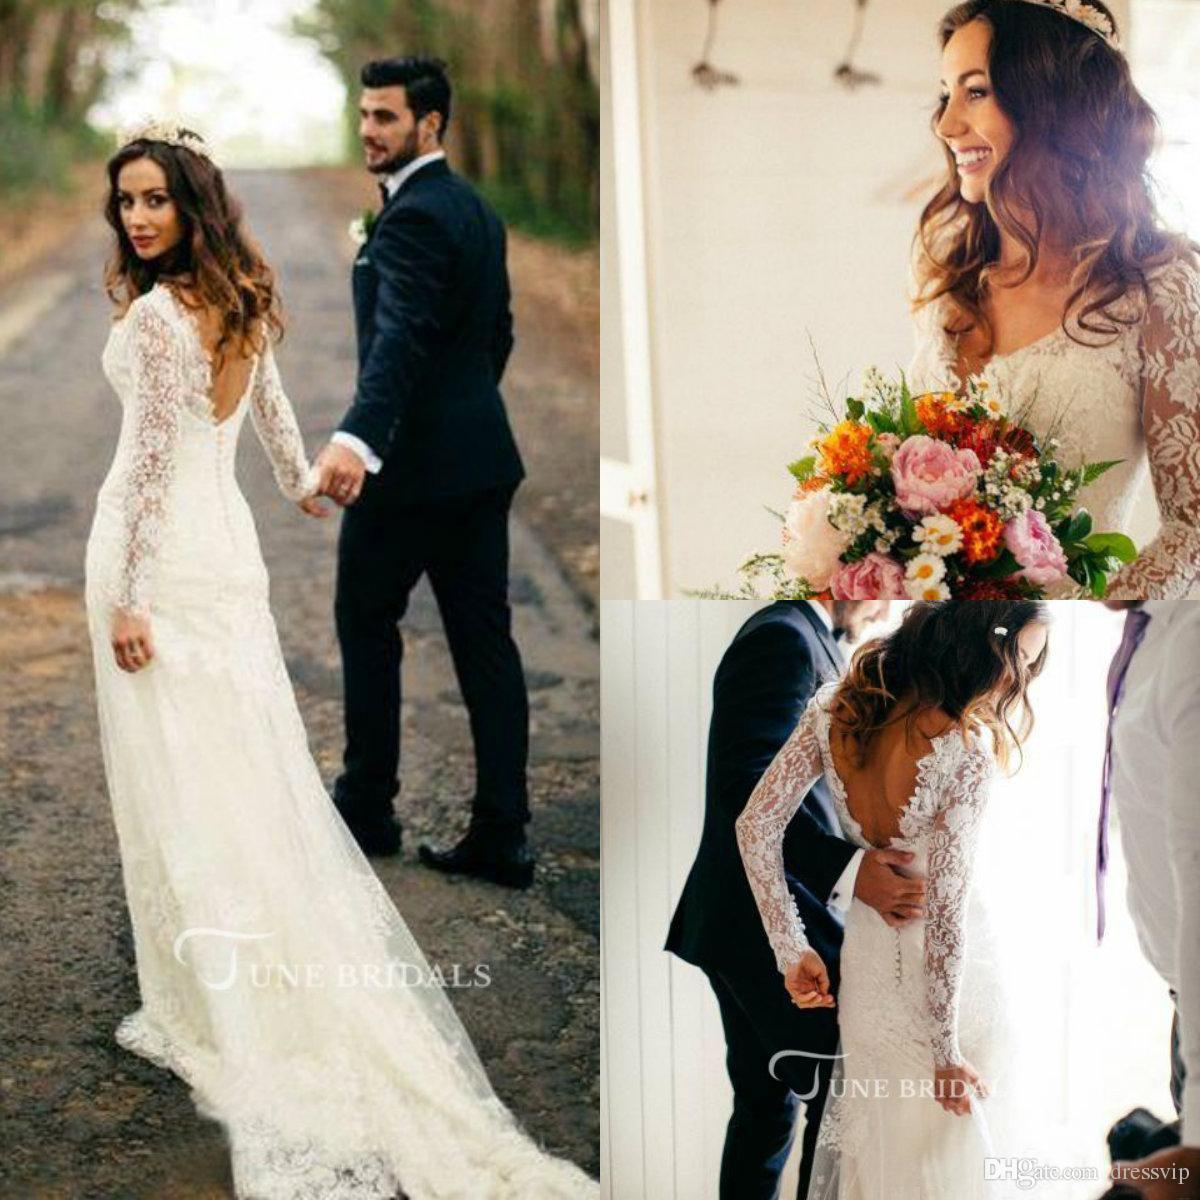 bf5e20a2ff5 Discount Cheap 2018 Simple Bohemian Beach Wedding Dresses Country Long  Sleeves Sweep Train Summer Boho Hippie Western Bridal Gowns Wedding Dresses  Big ...